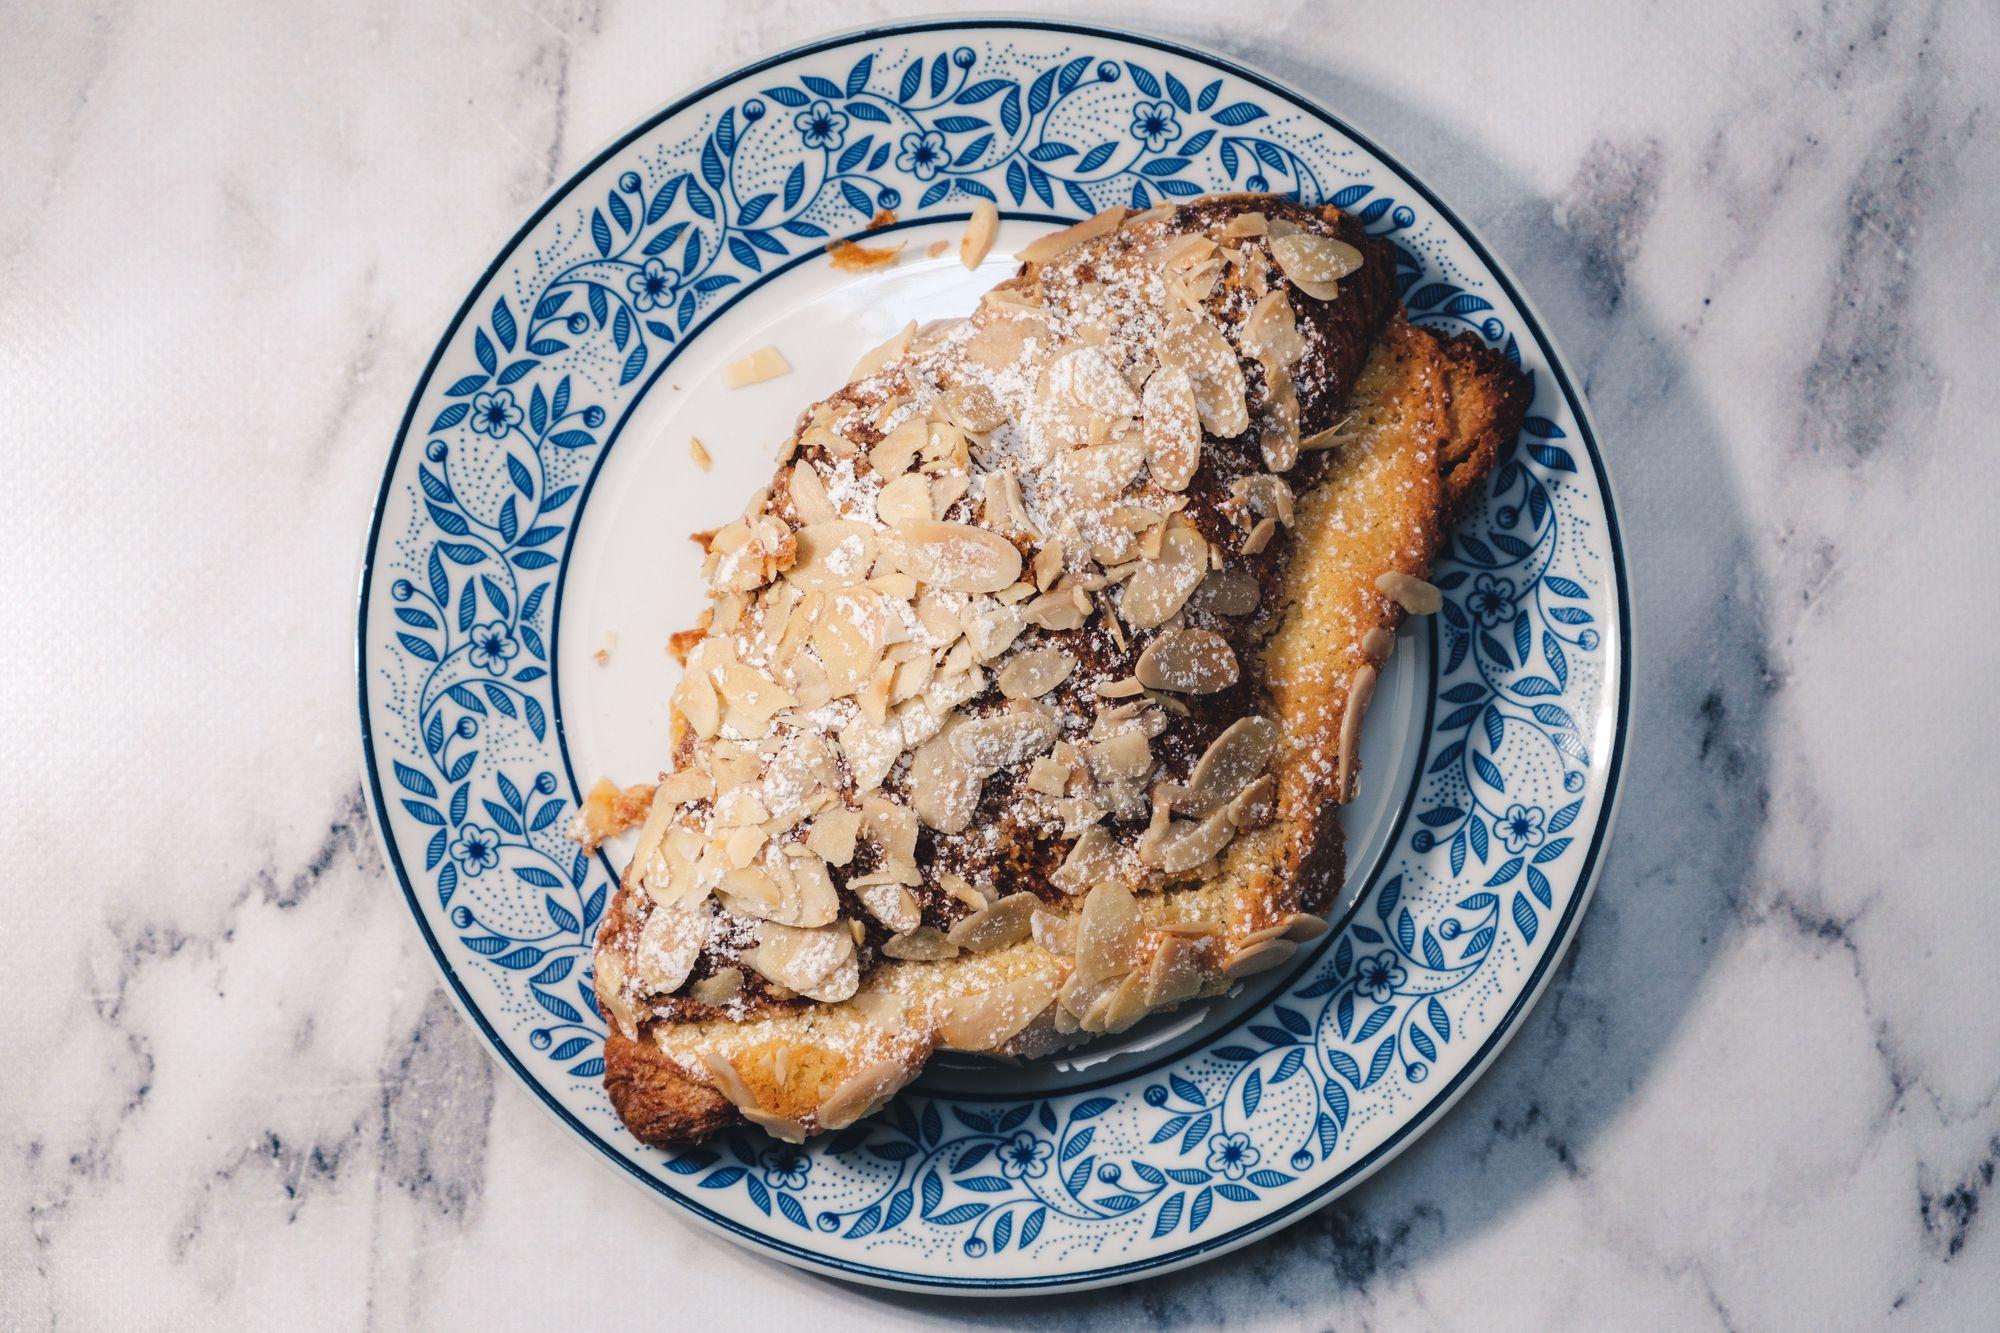 Temper Almond Croissant ($5.50) - Overhead